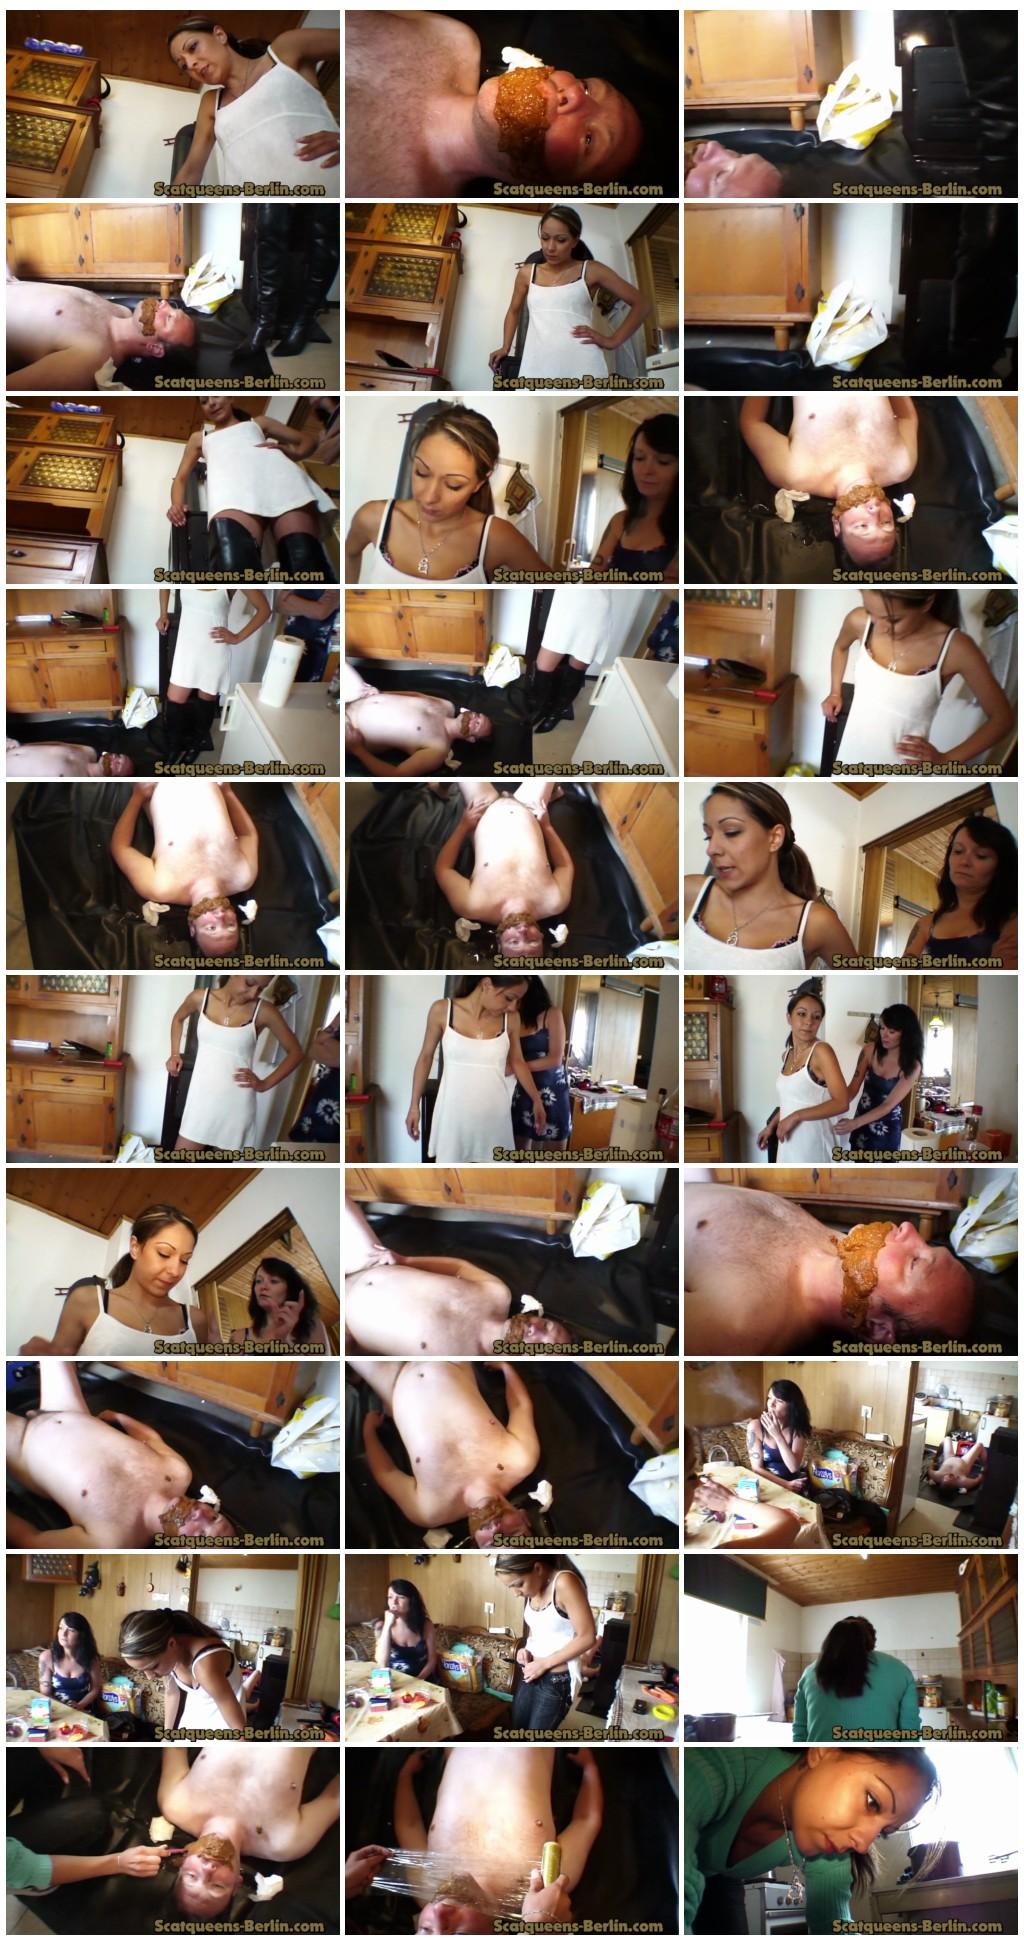 Lady Missy Garden Toilet P4 Scat pissing shit defecation Femdom Toilet SlaverySmearing Face shitFingeringDomination Eat shit HumiliationsLicking Drink peespitting thumb - Lady Missy -Garden Toilet P4 [Scat, pissing, shit, defecation, Femdom ,Toilet Slavery,Smearing, Face shit,Fingering,Domination, Eat shit , Humiliations,Licking, Drink pee,spitting]